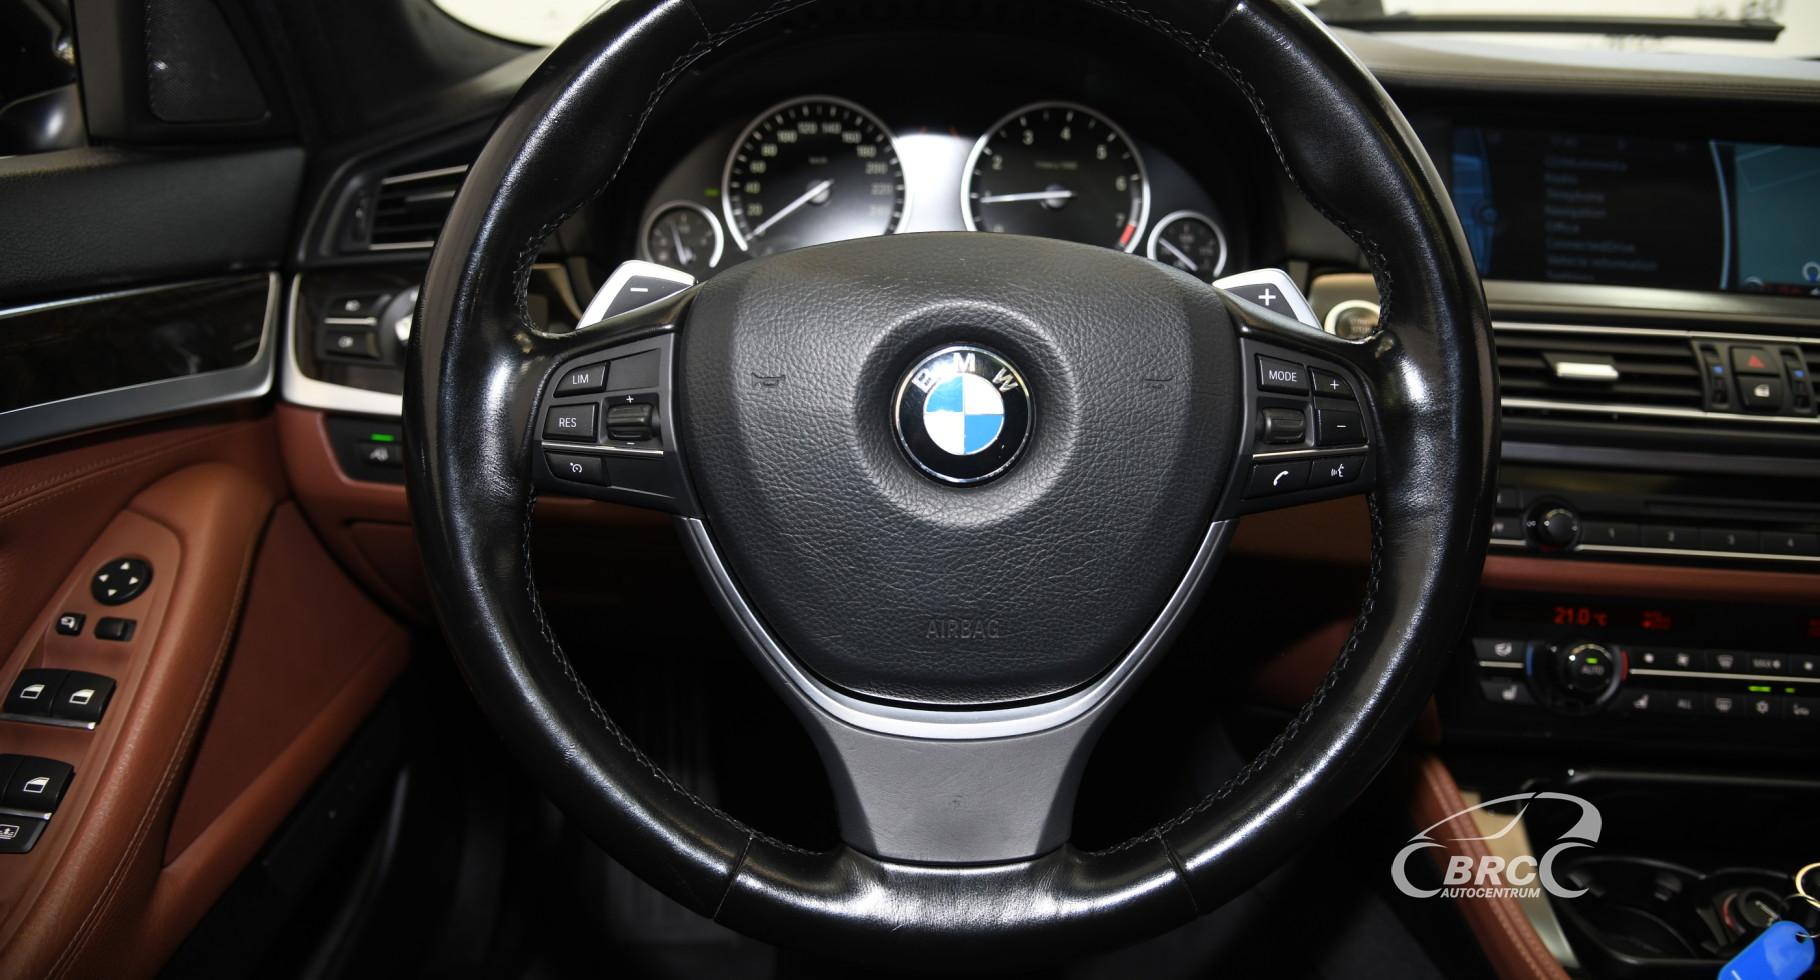 BMW 535 Active Hybrid 5 Automatas